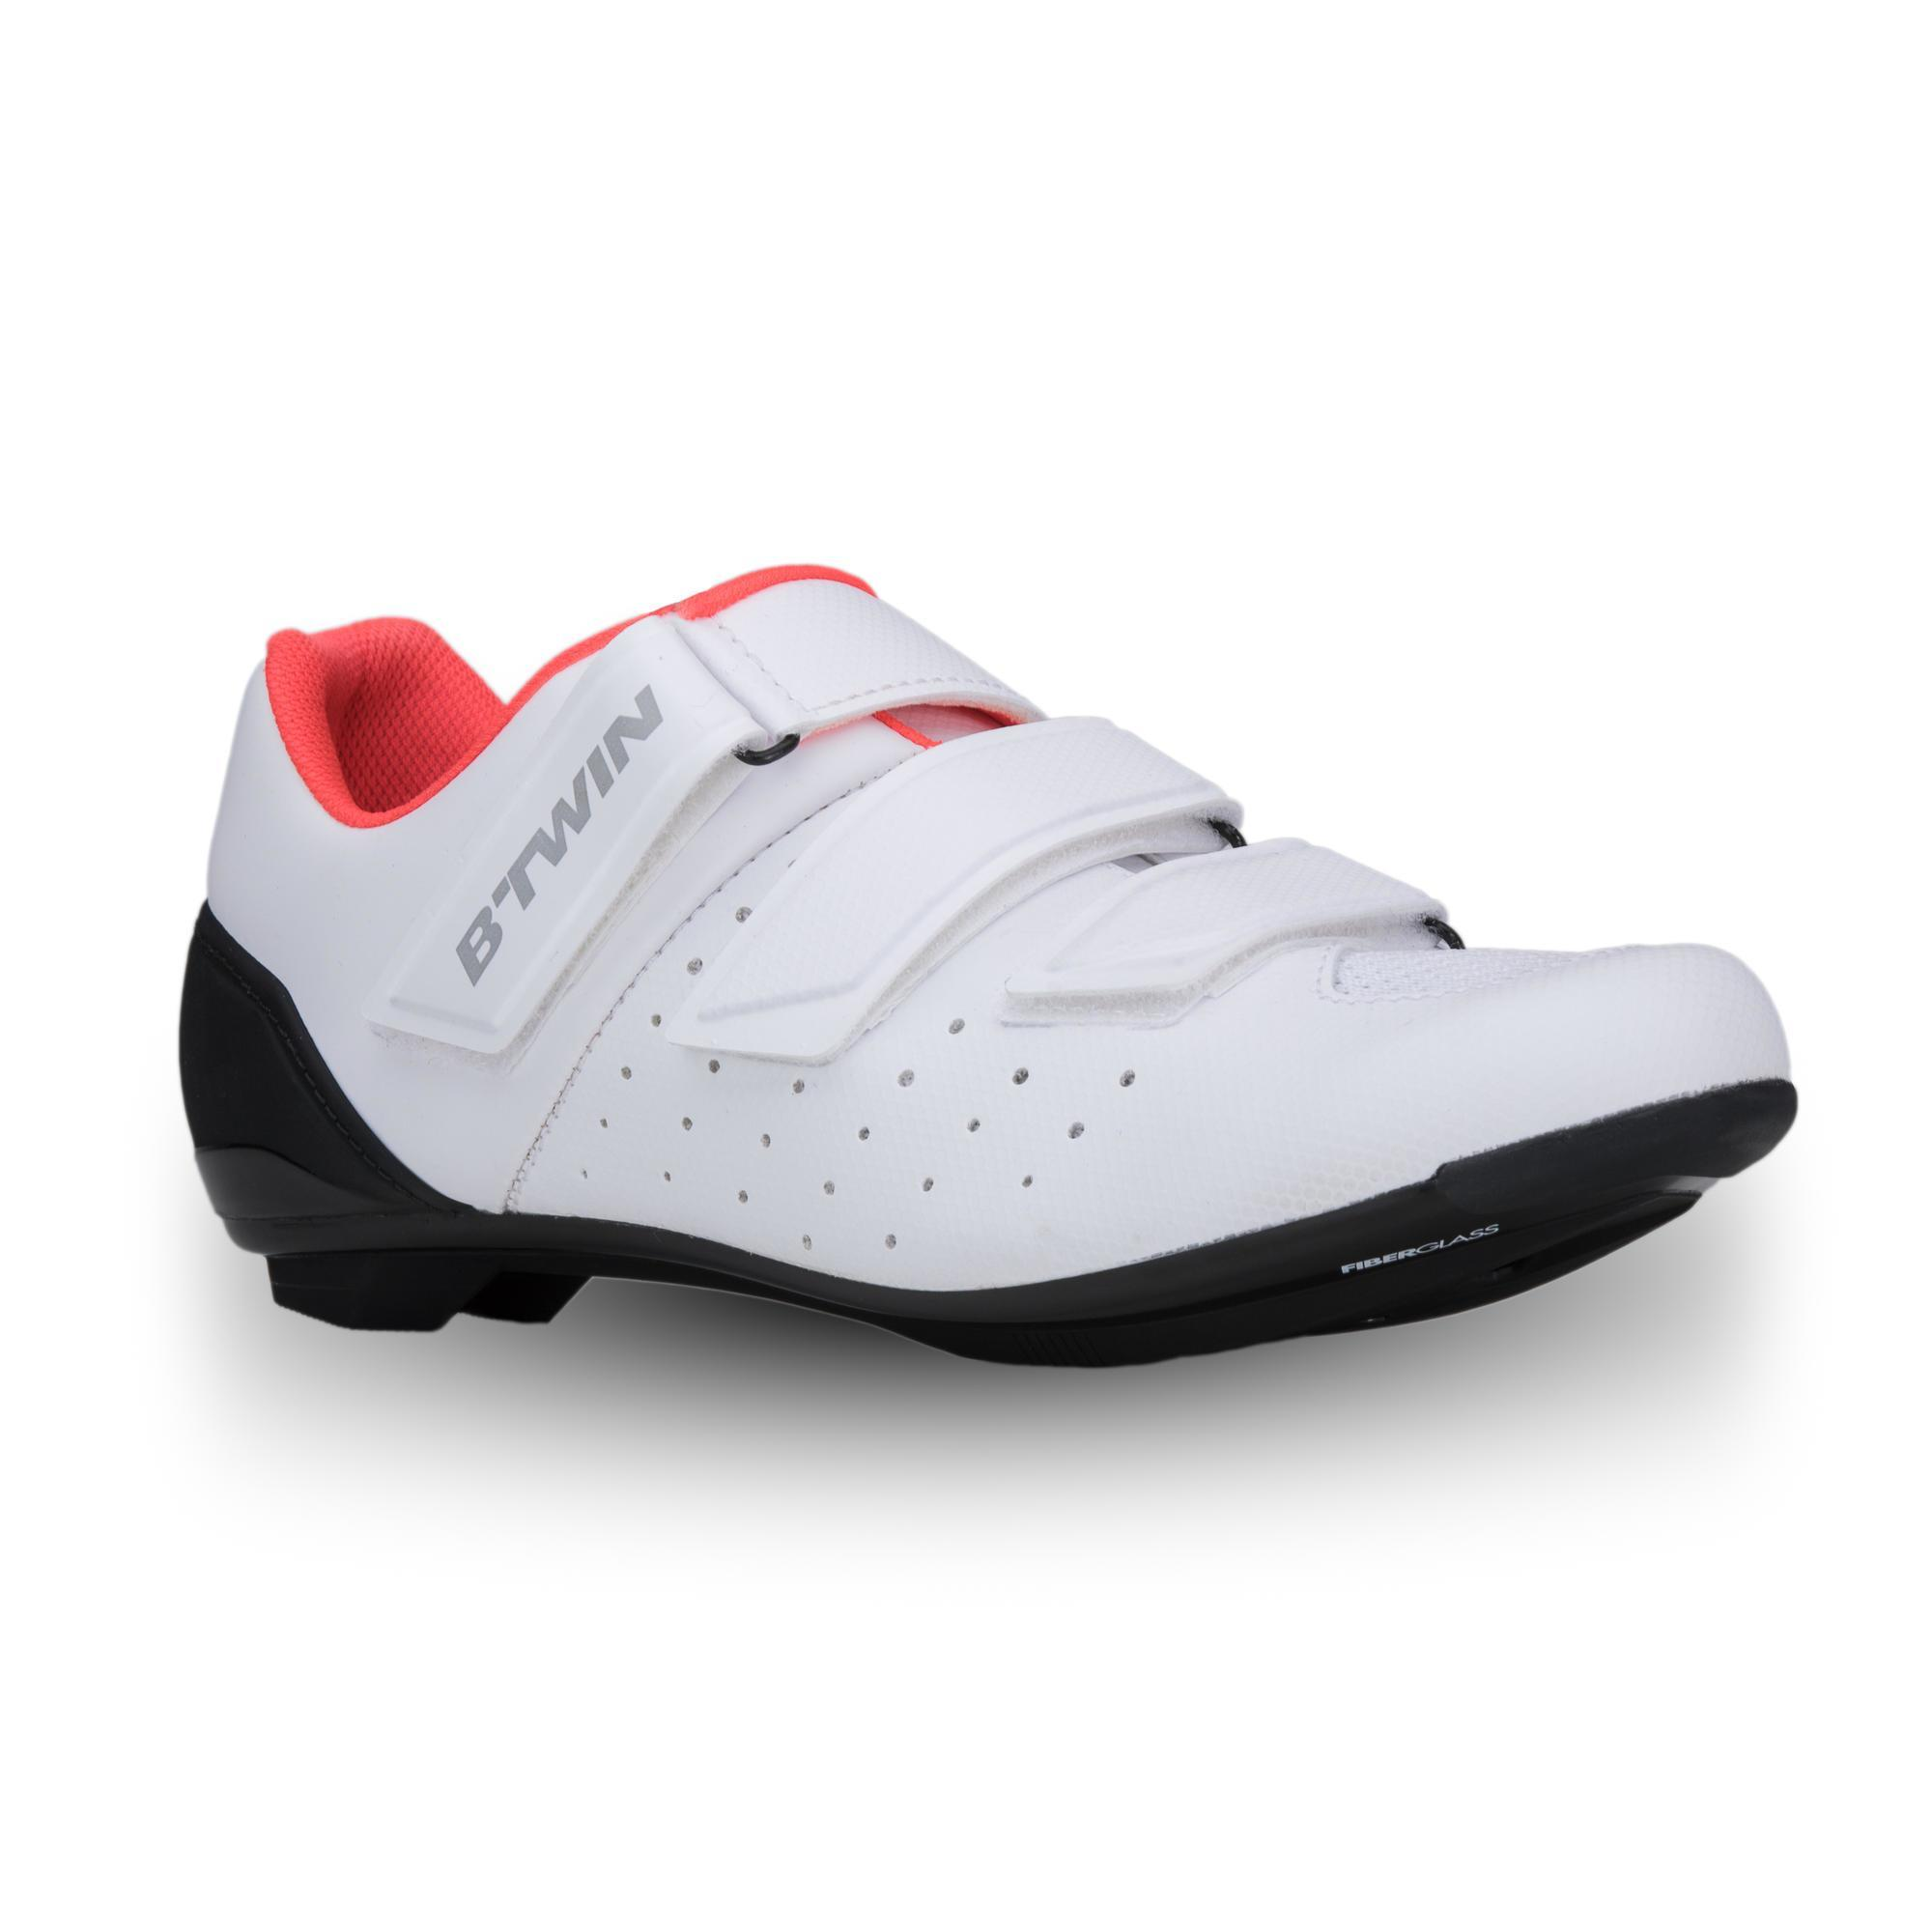 Fahrradschuhe Rennrad 500 rosa/weiß | Schuhe > Sportschuhe > Fahrradschuhe | Rot - Rosa - Weiß | B´twin